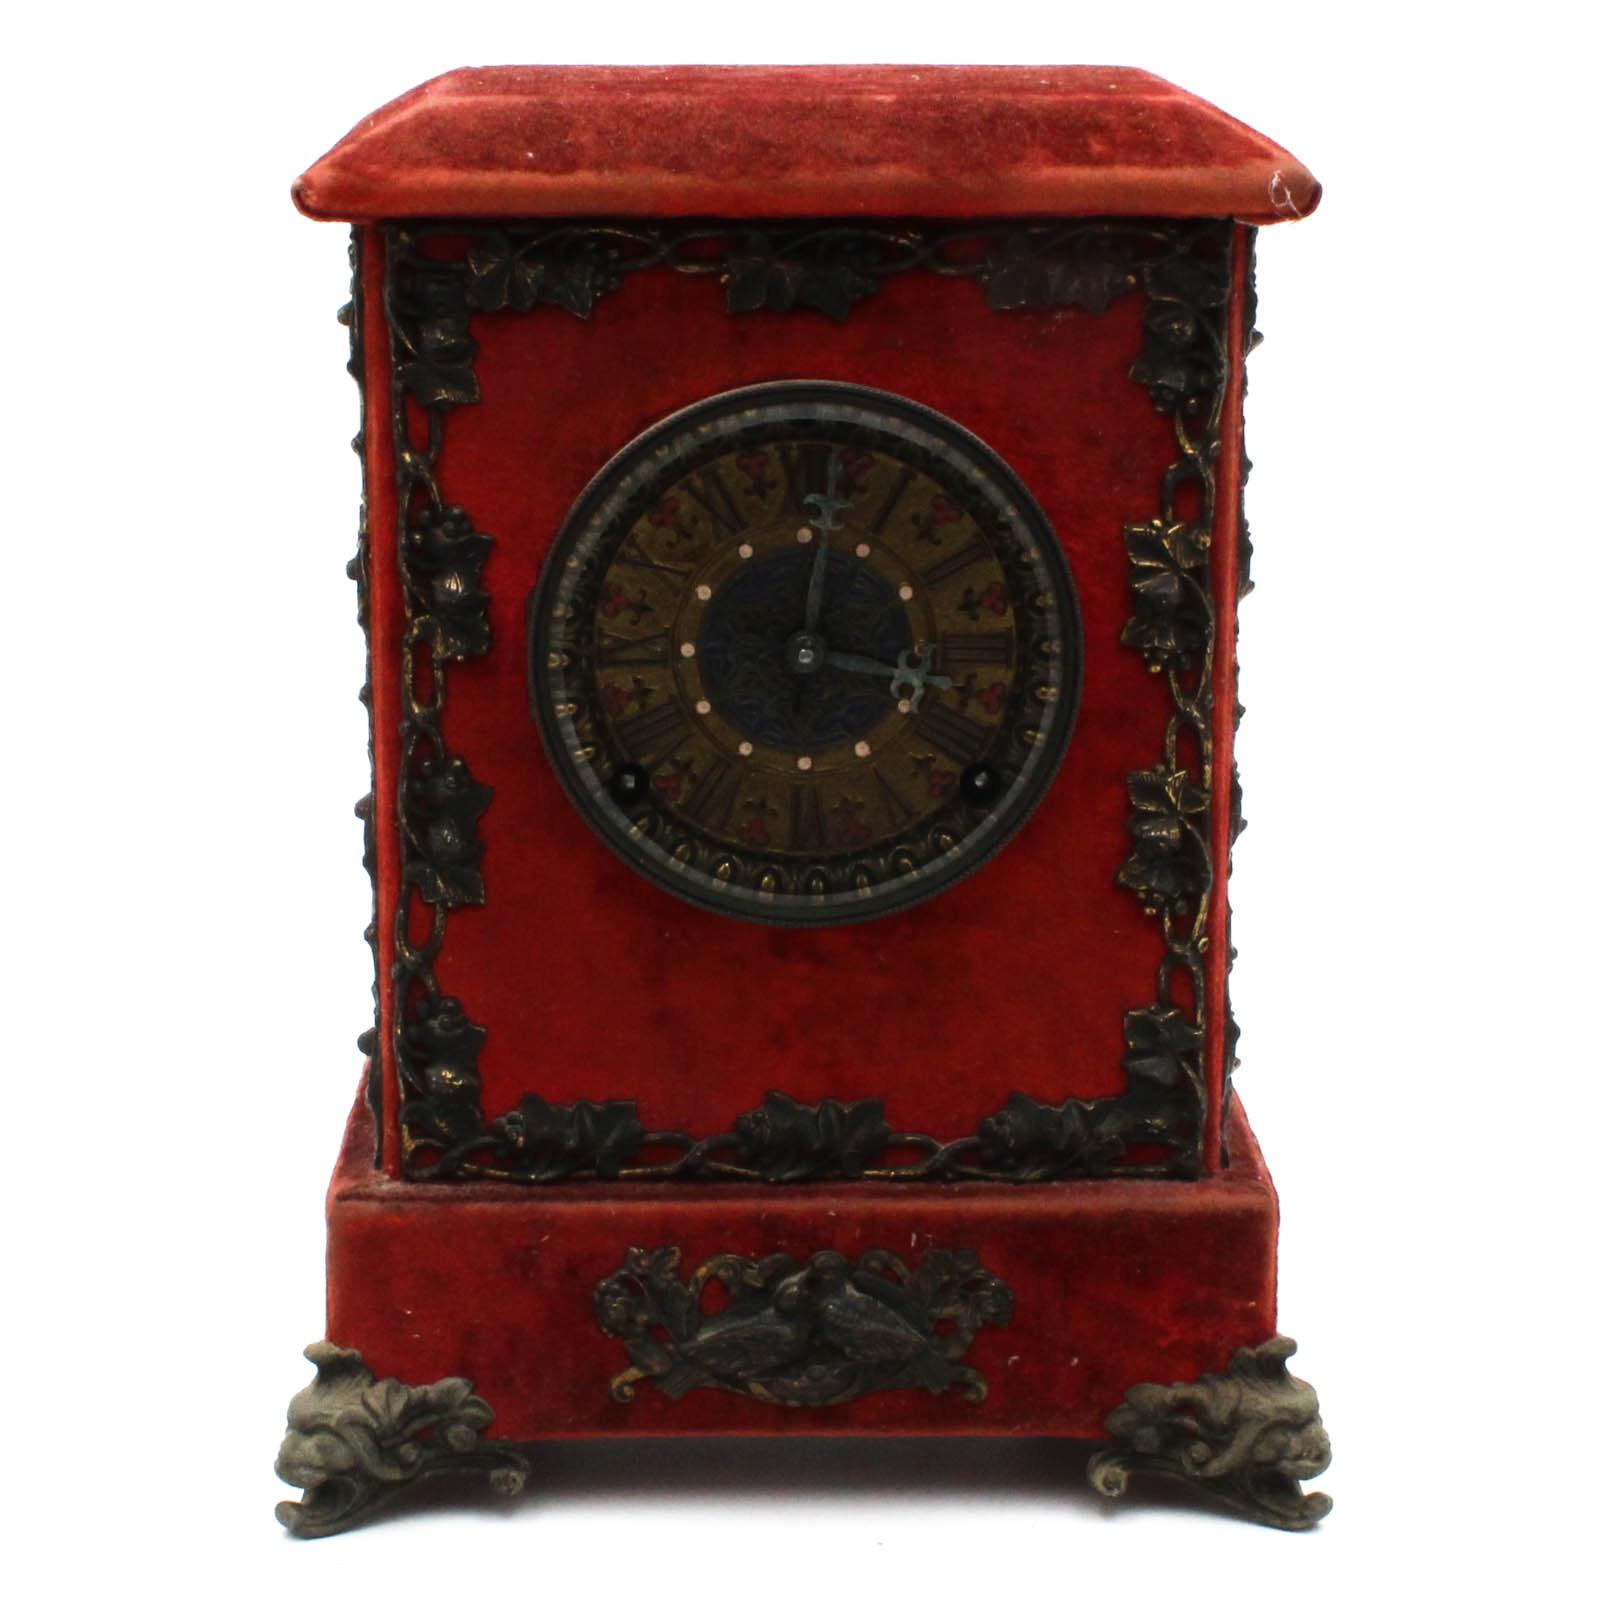 Antique Ansonia Red Velvet and Enameled Mantle Clock